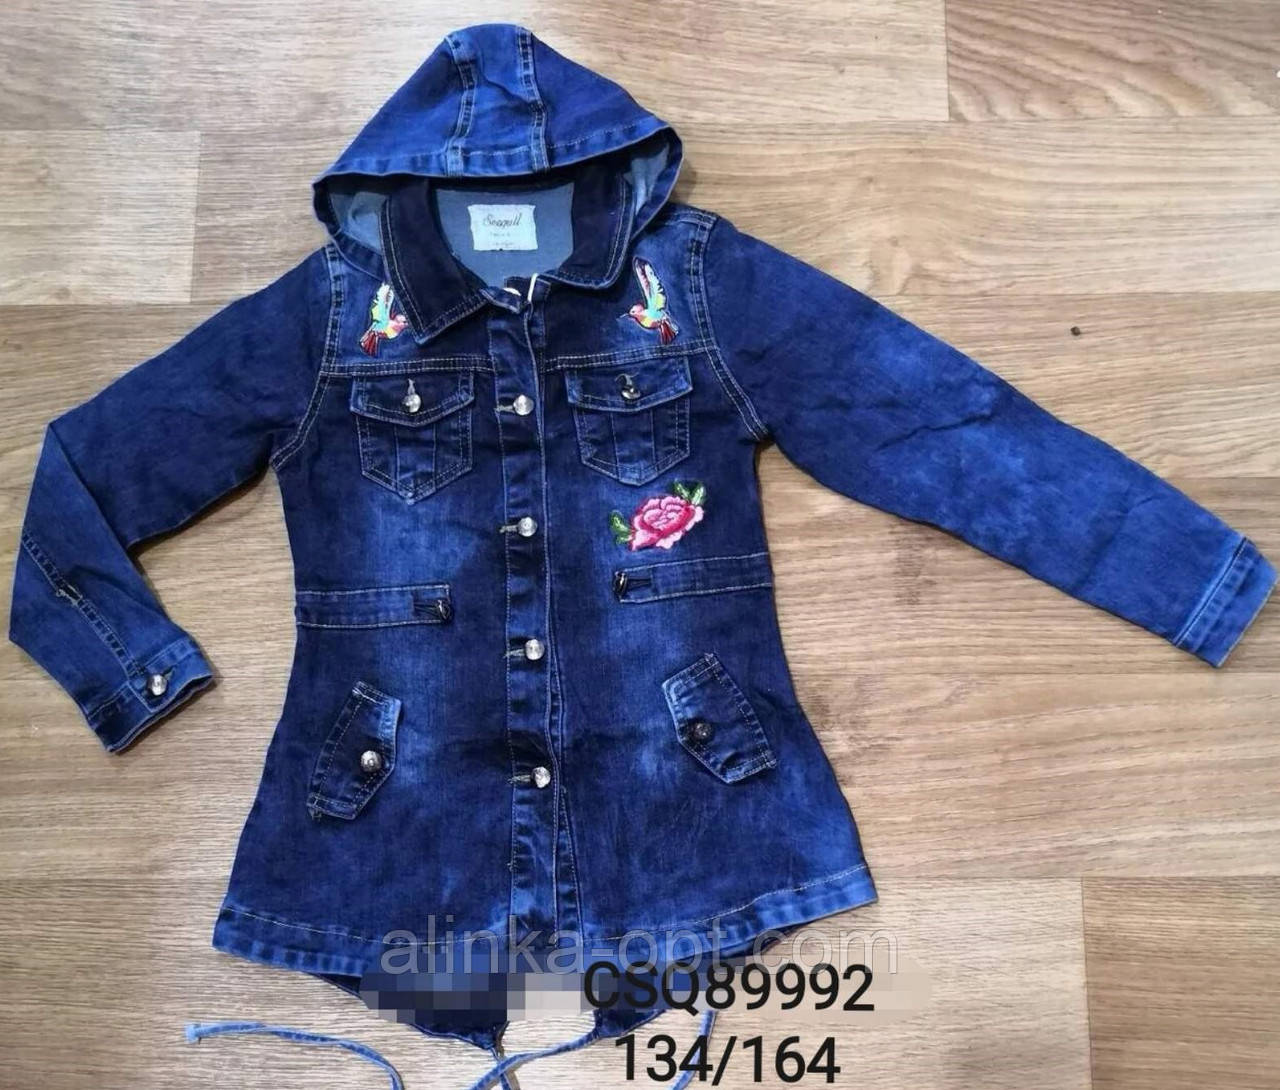 Джинсовая курточка для девочек Seagull , 134-164 рр. Артикул: CSQ89992